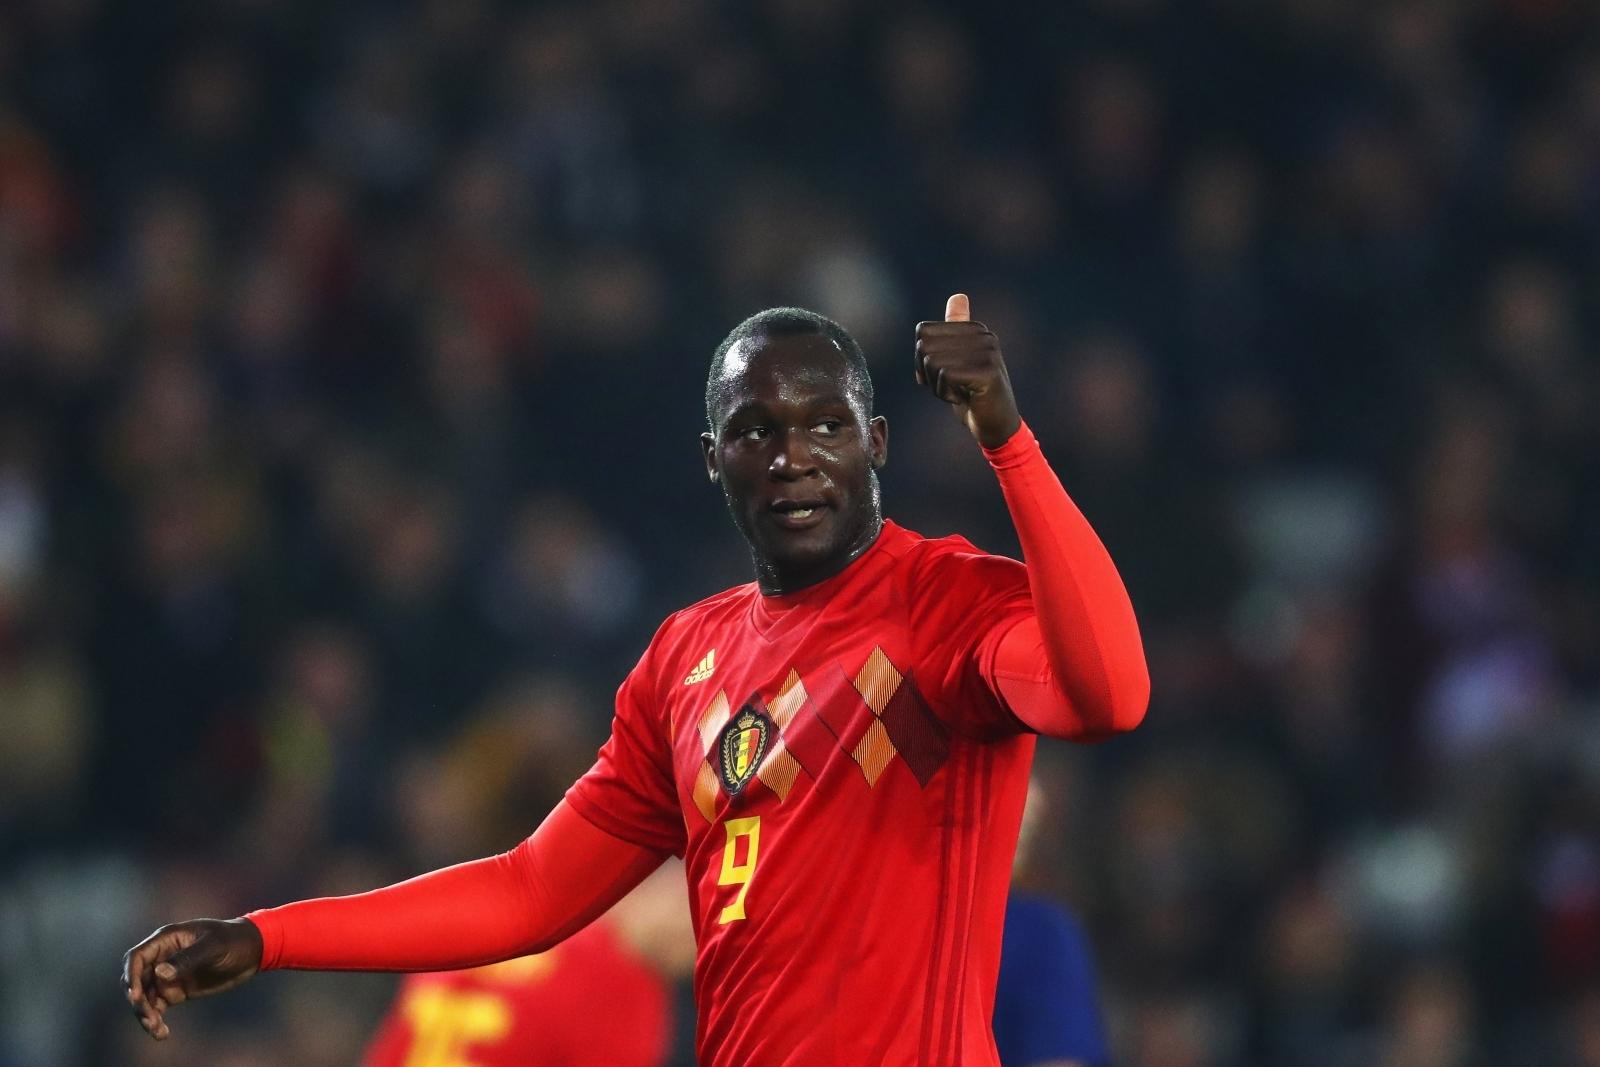 Romelu Lukaku Manchester United striker be es Belgium s all